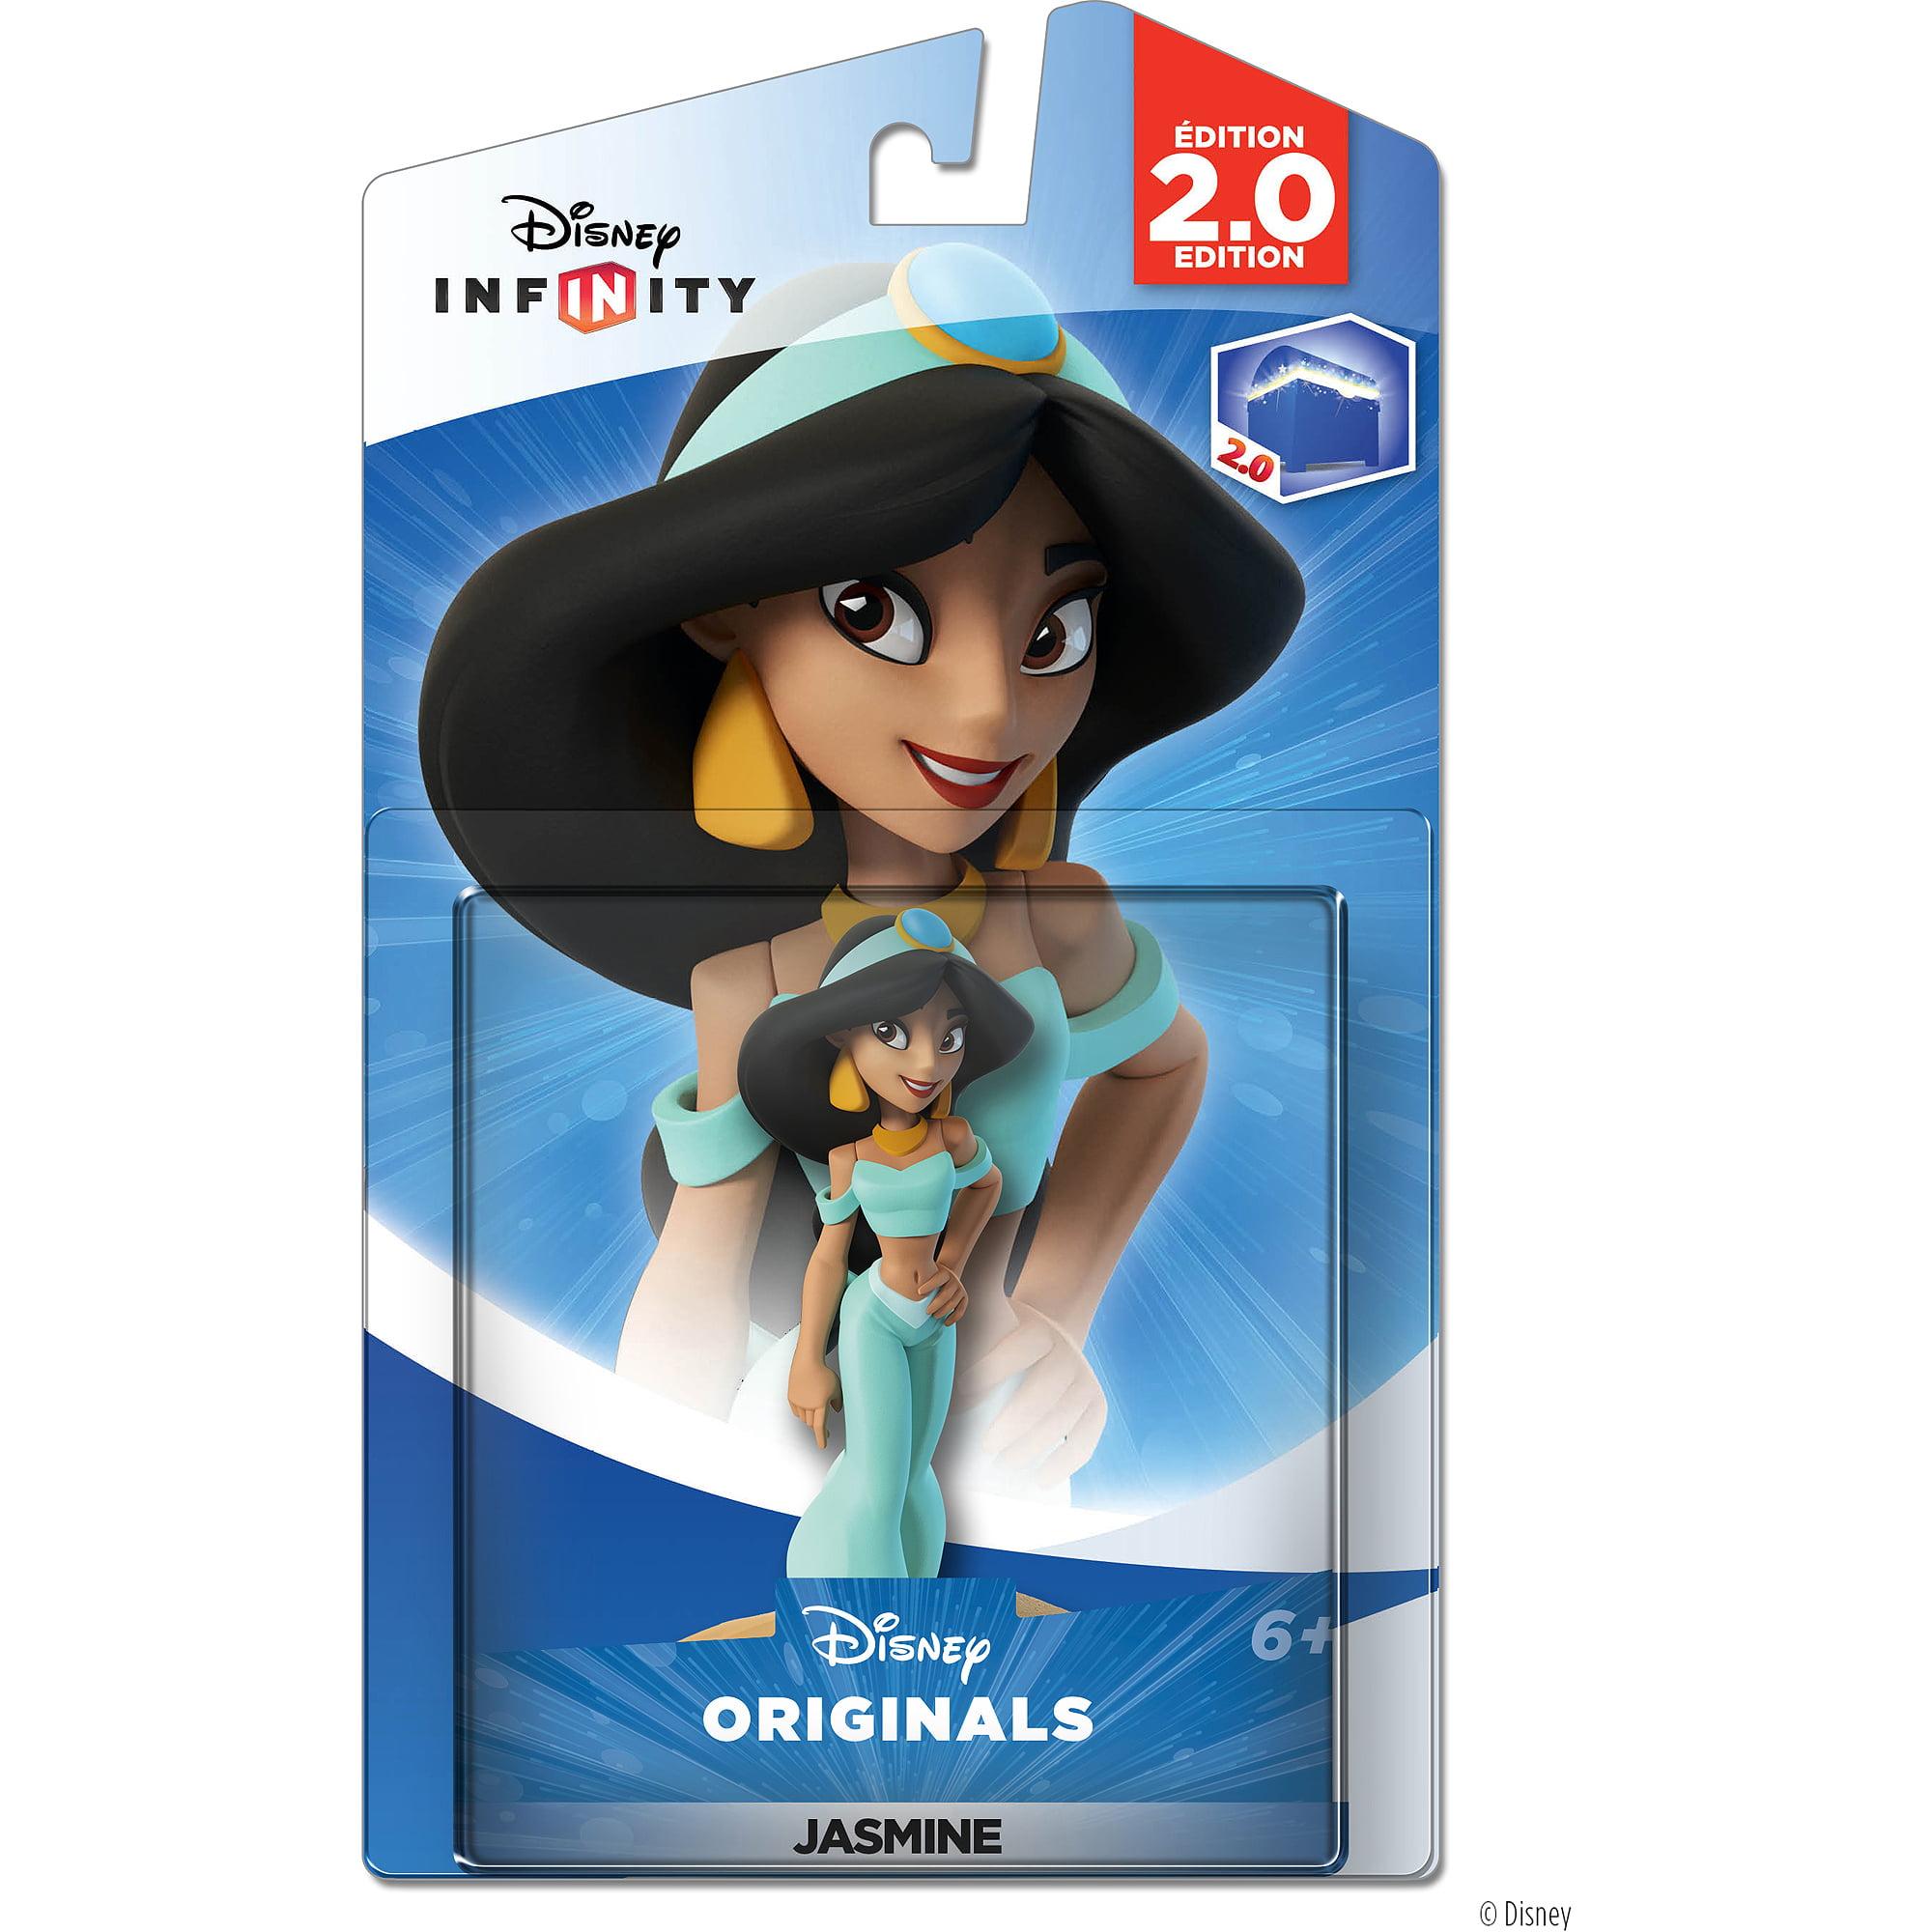 Disney Infinity: Disney Originals (2.0 Edition) Jasmine Figure (Universal) by Disney